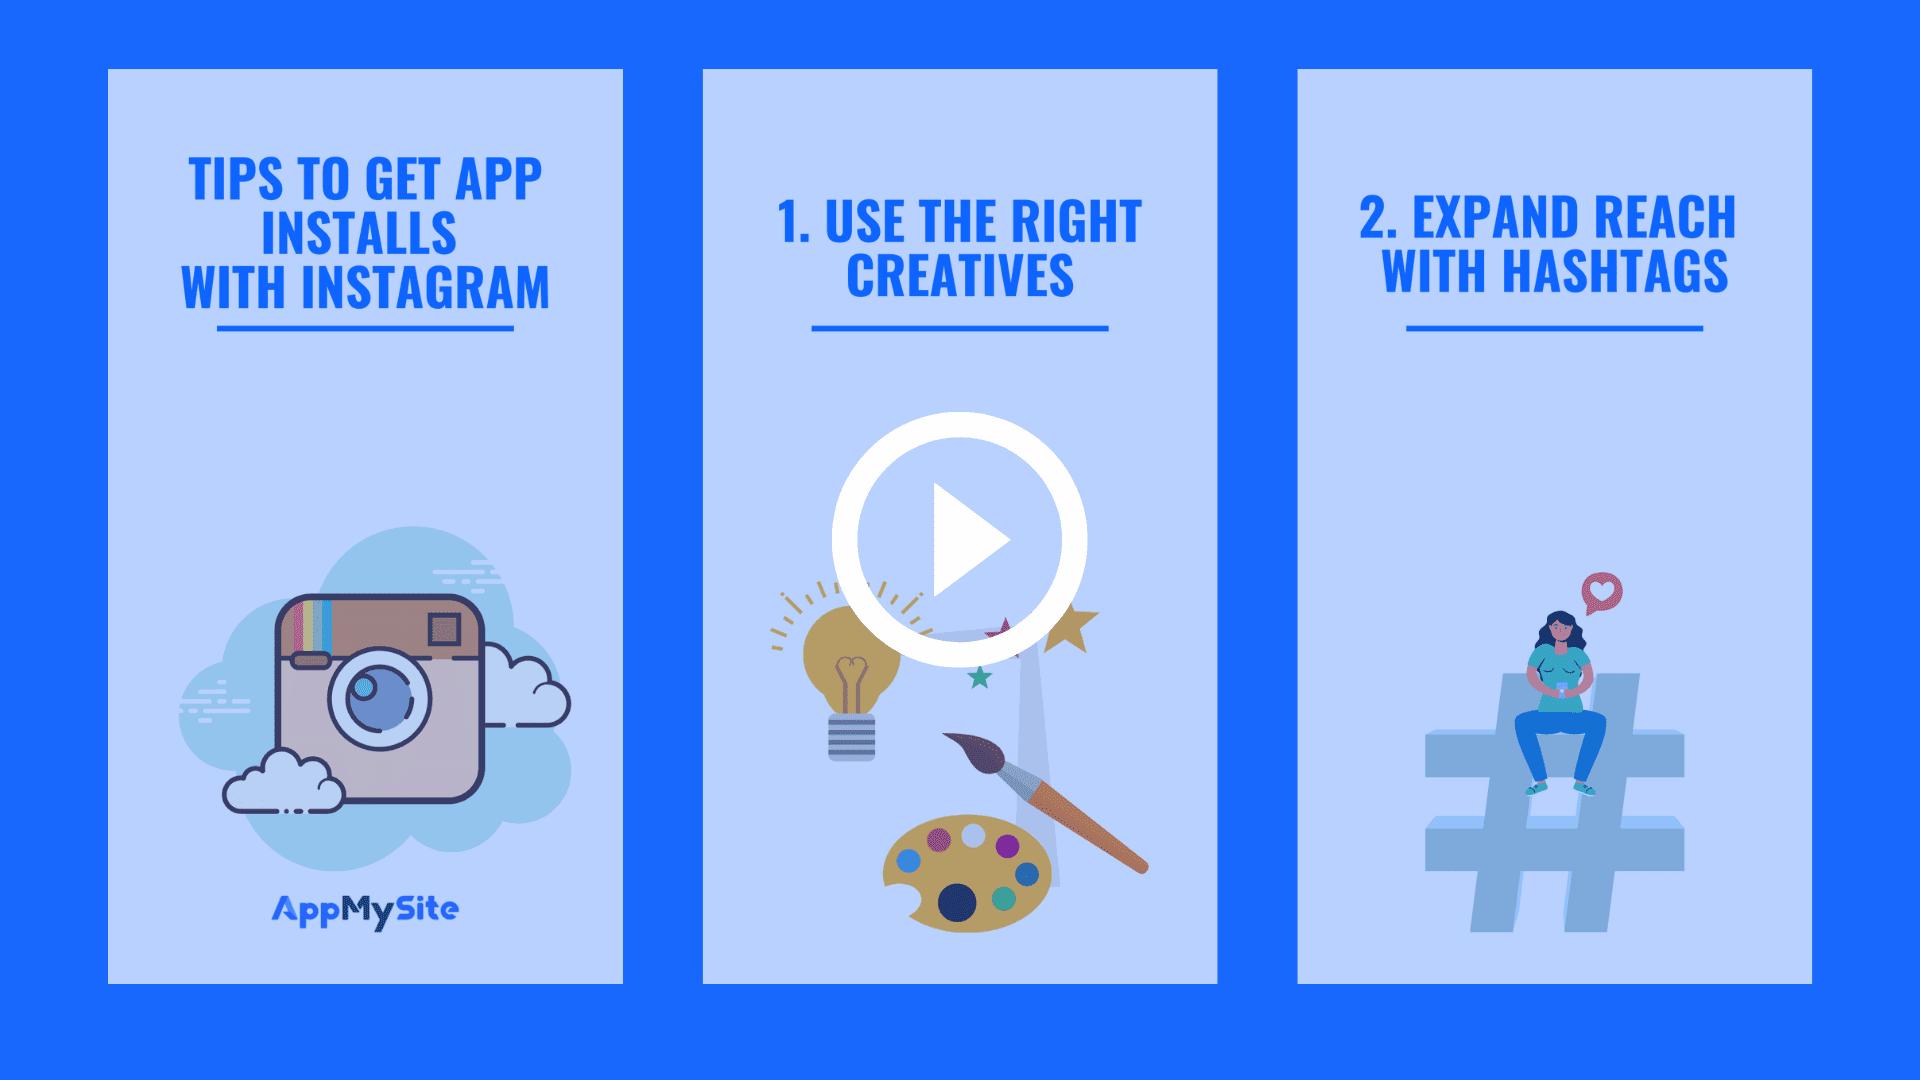 Tips to get app installs with Instagram